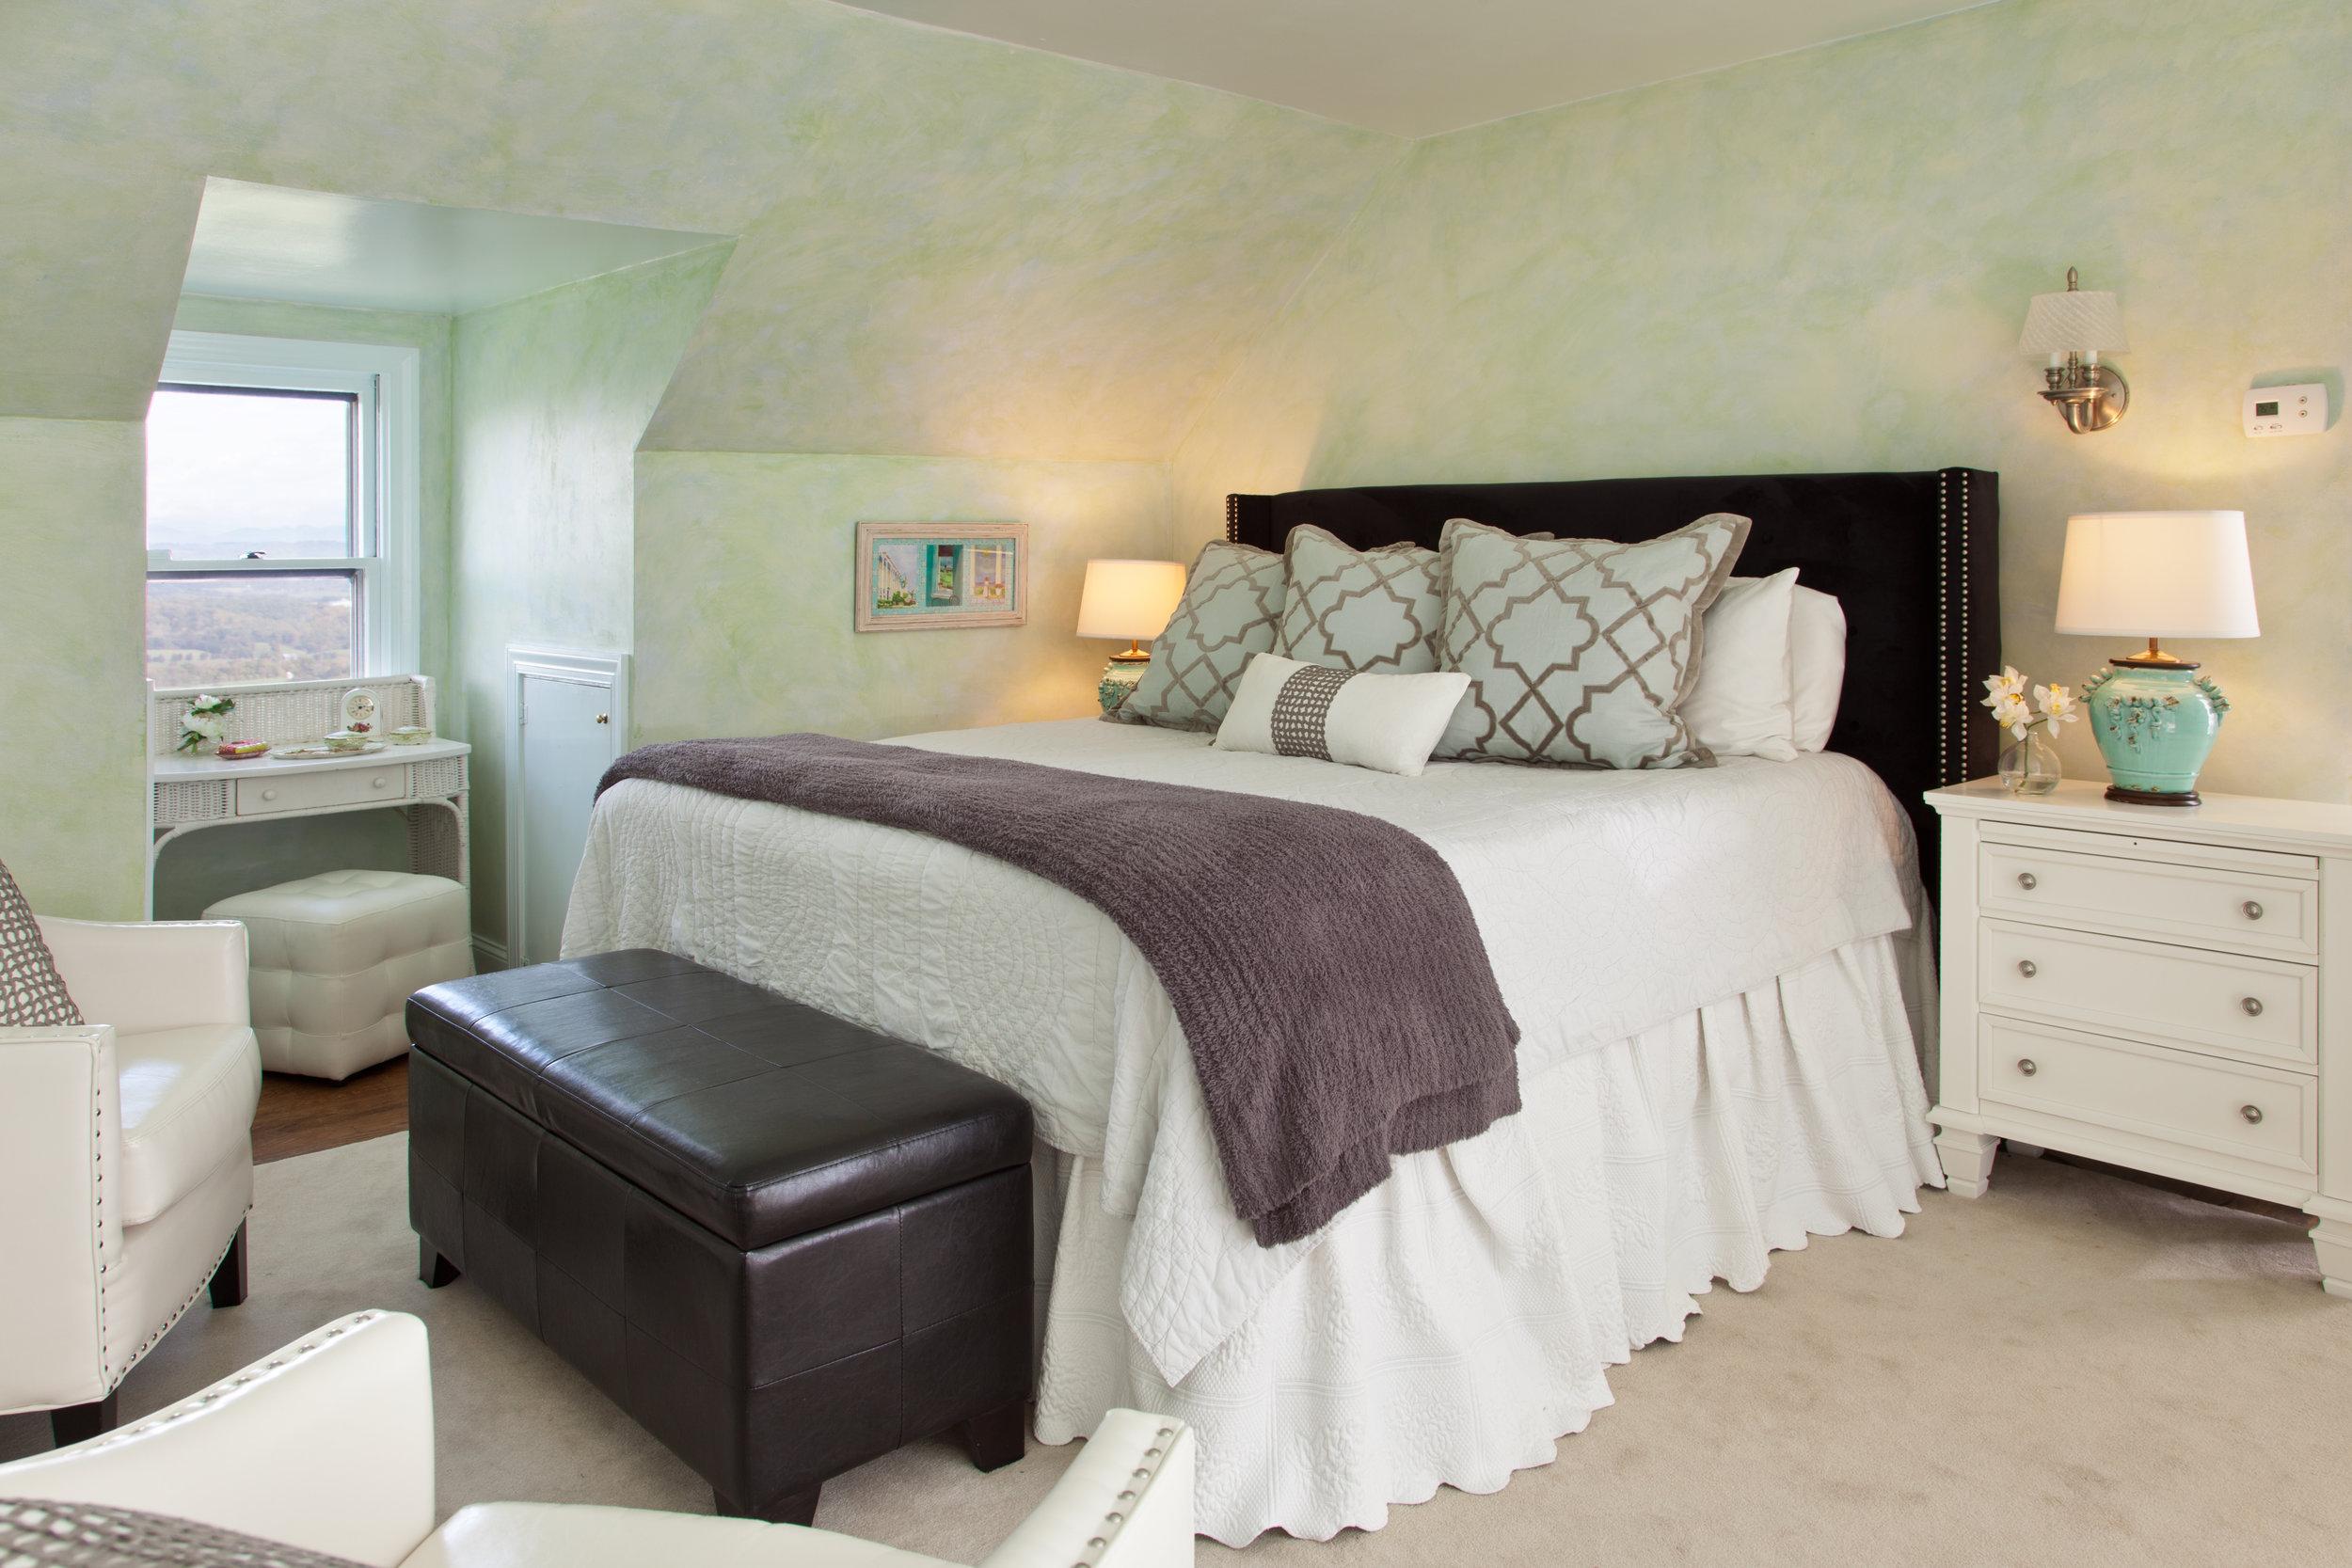 Bedroom Two - ◼︎ On the second floor◼︎ En suite bath◼︎ King bed◼︎ Twin bed◼︎ Crib